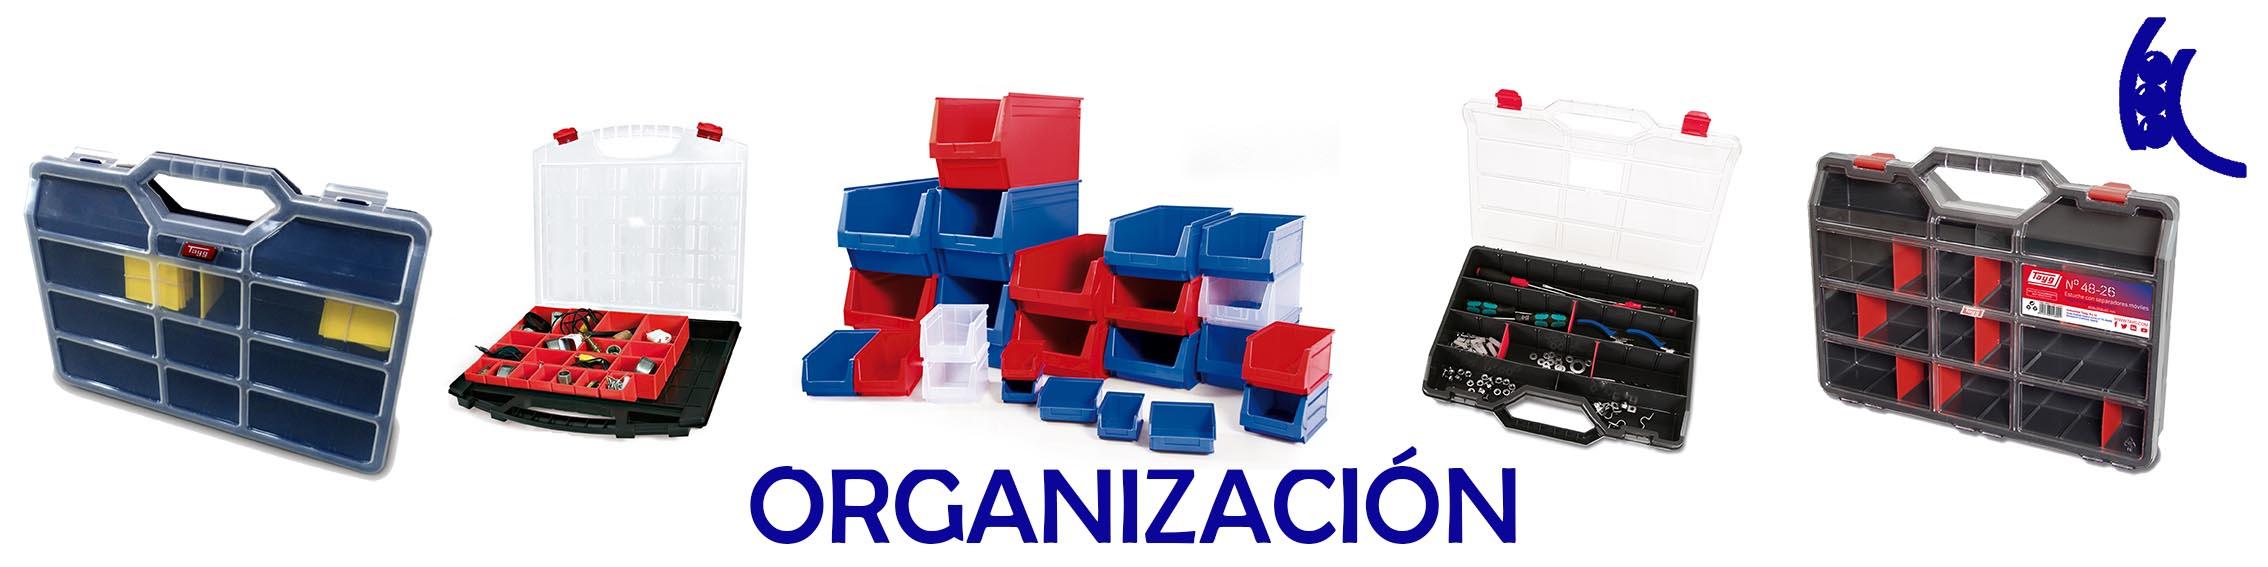 Organizadores Indauto